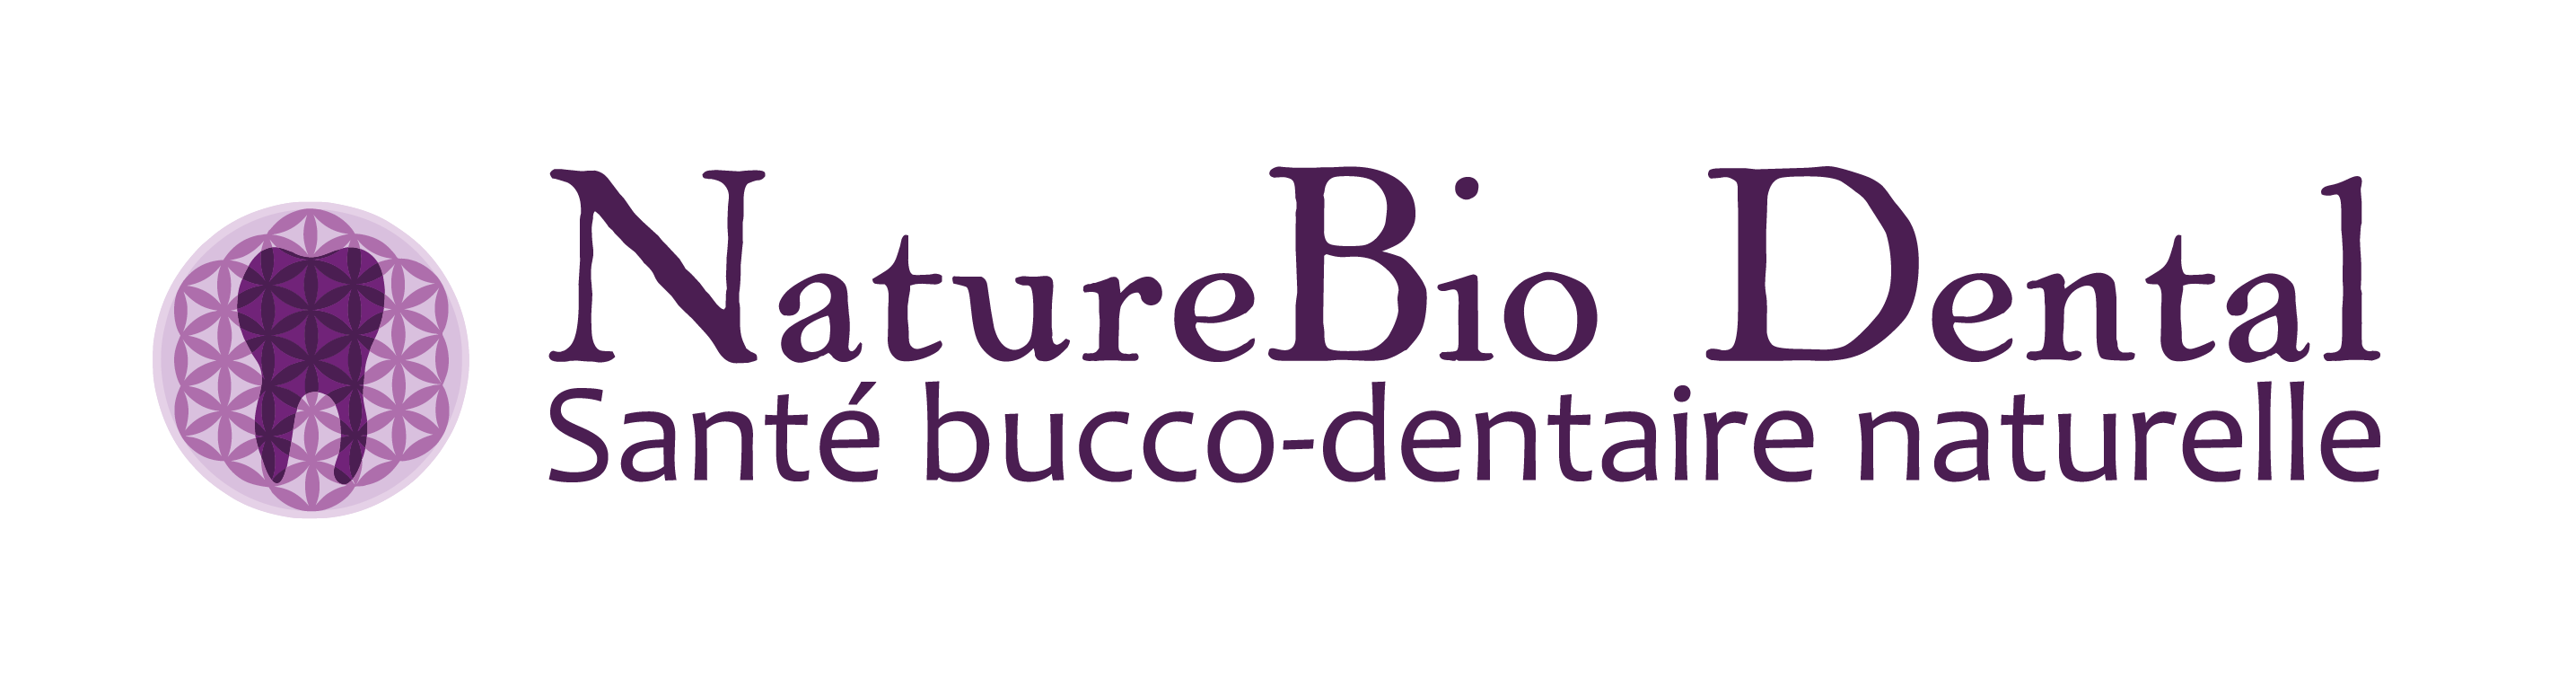 NatureBio Dental Pro